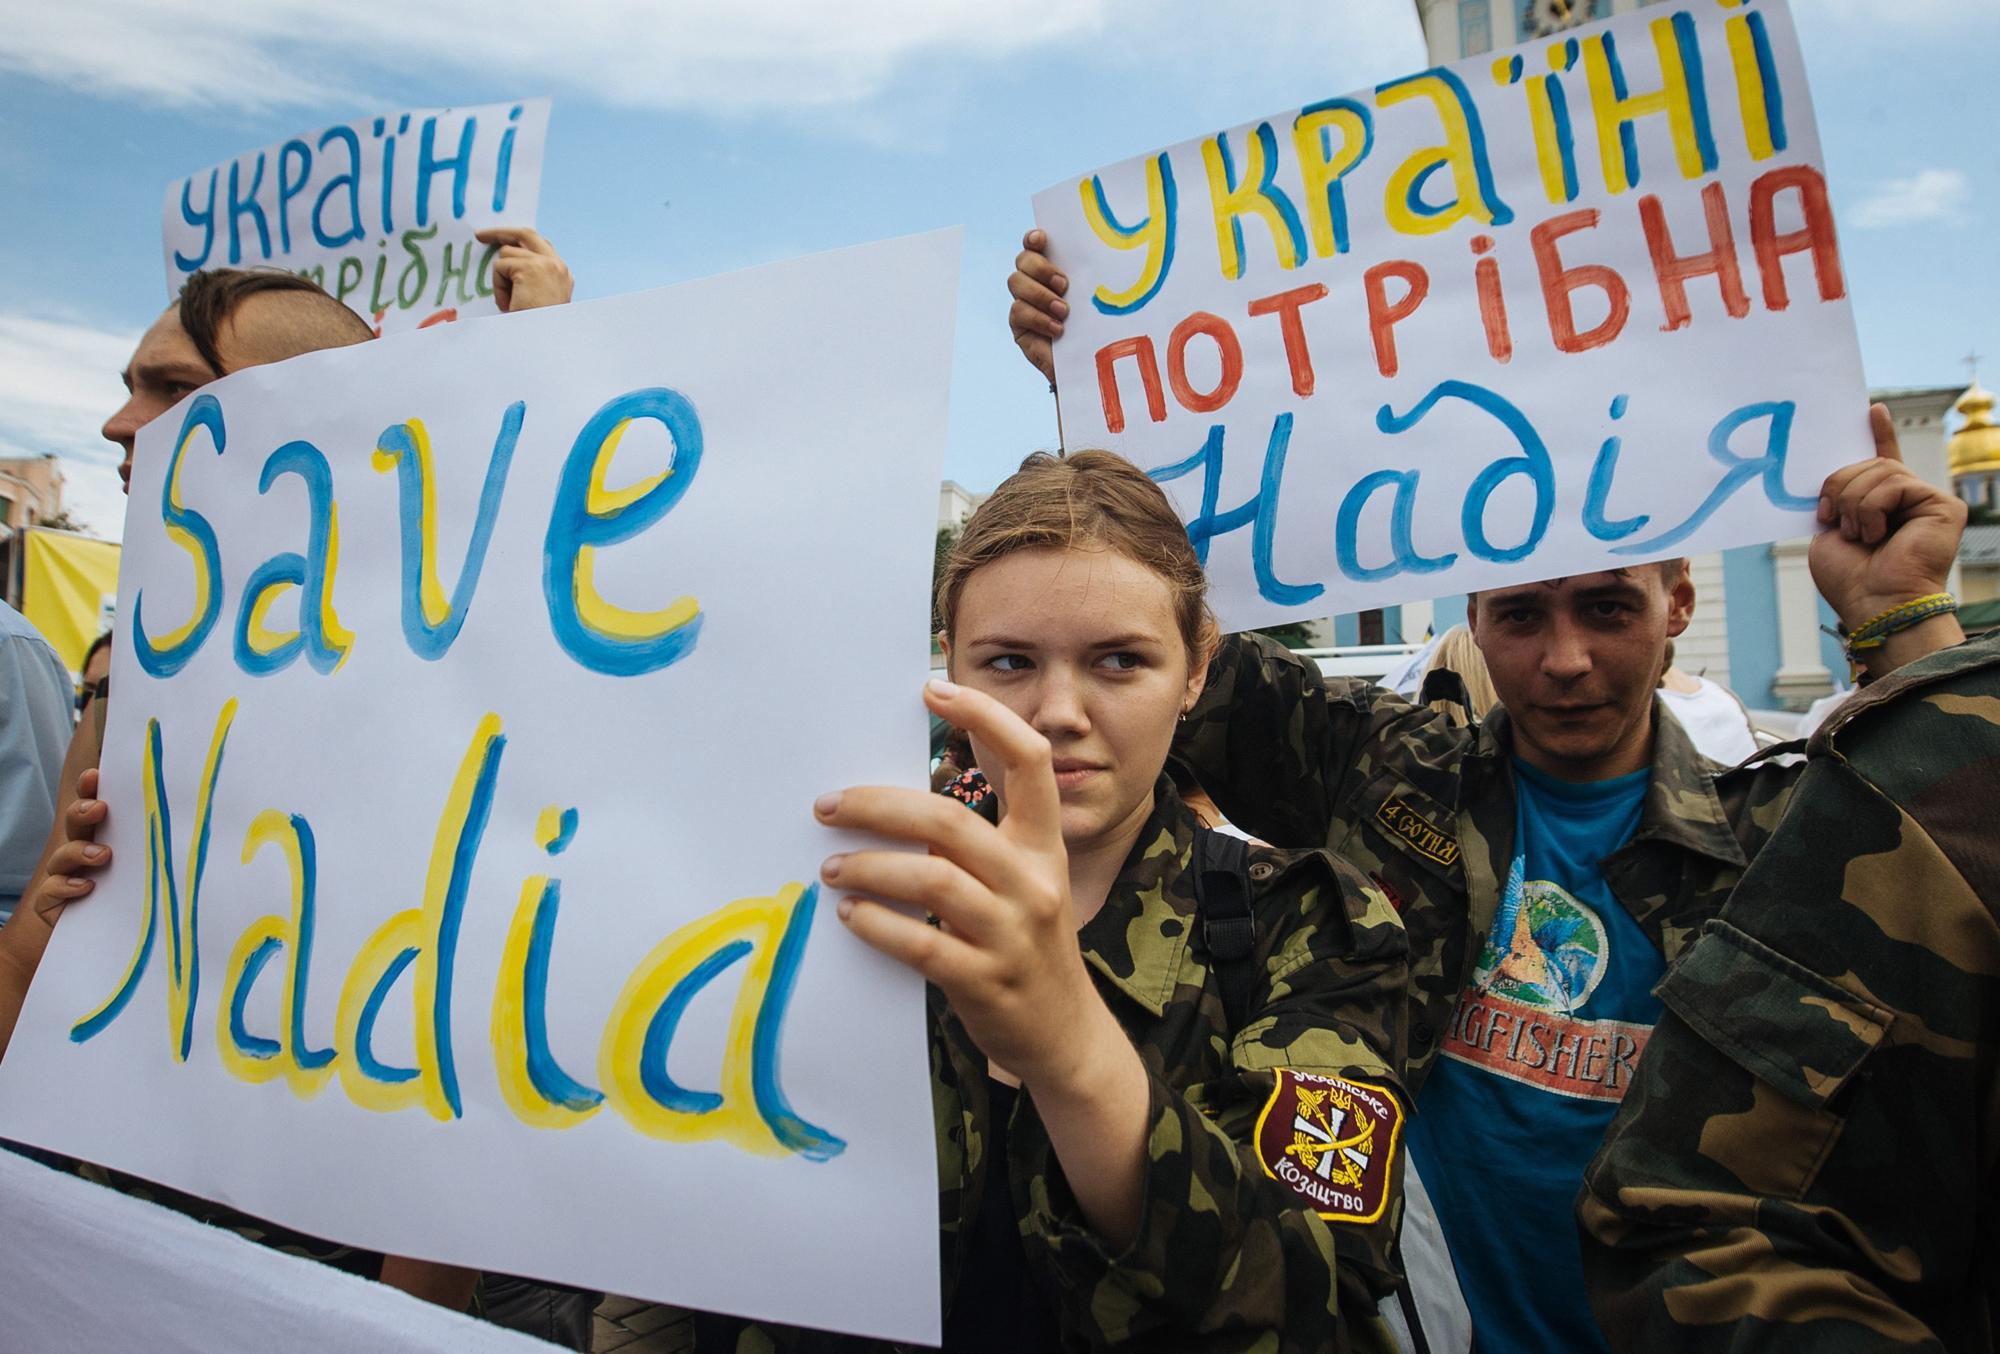 Ukrainian activists demanding the release of Ukrainian officer Nadiya Savchenko from Russian prison in Kiev, Ukraine, July 11.